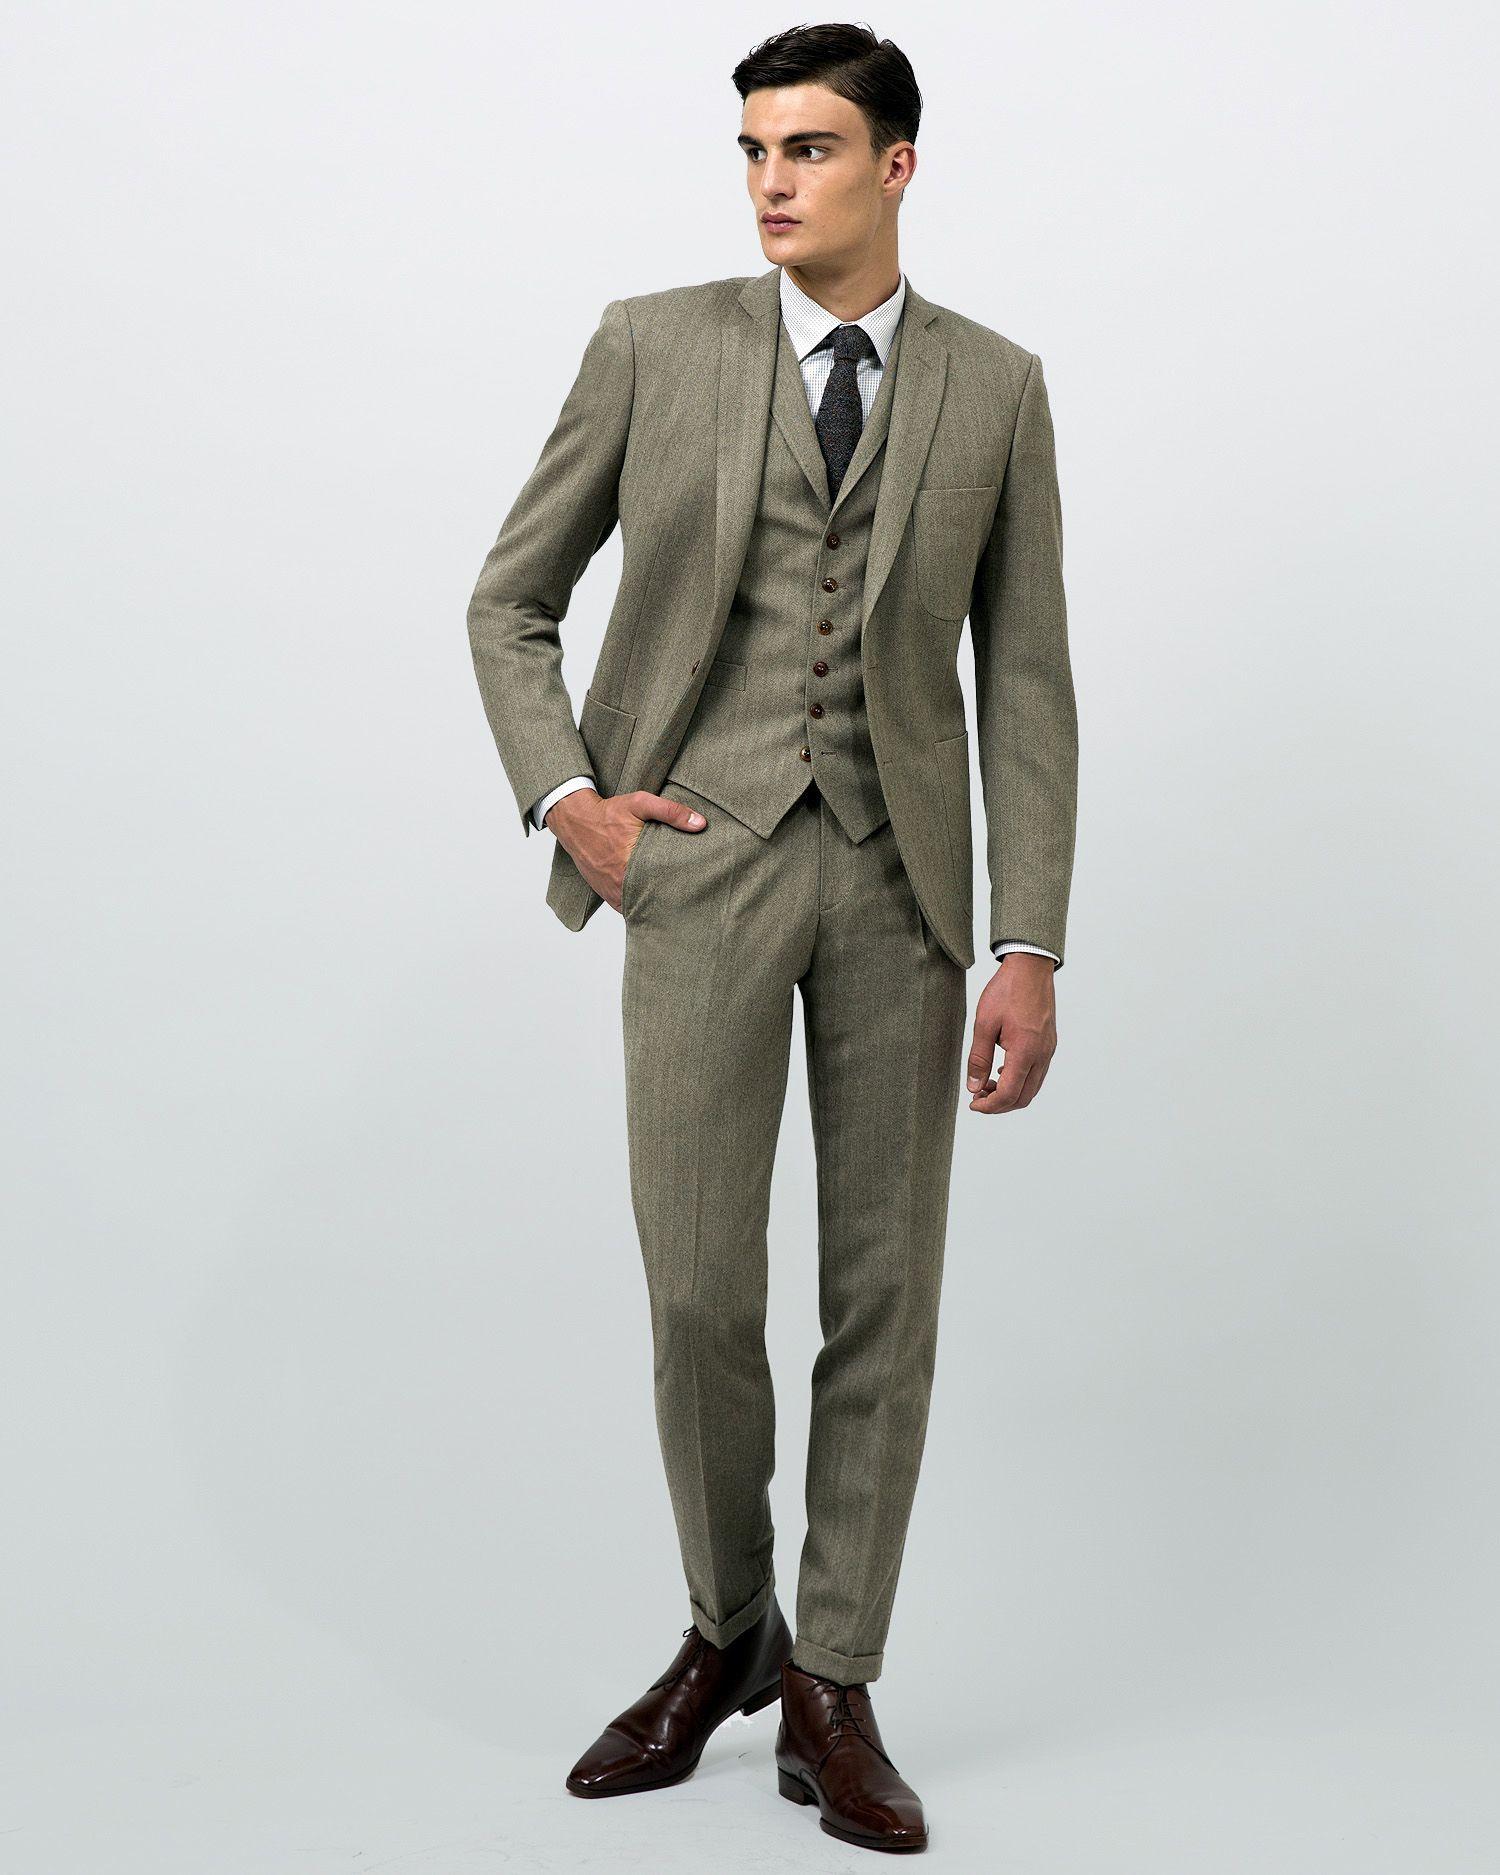 costume sur mesure en tweed chevrons beige 2 boutons. Black Bedroom Furniture Sets. Home Design Ideas